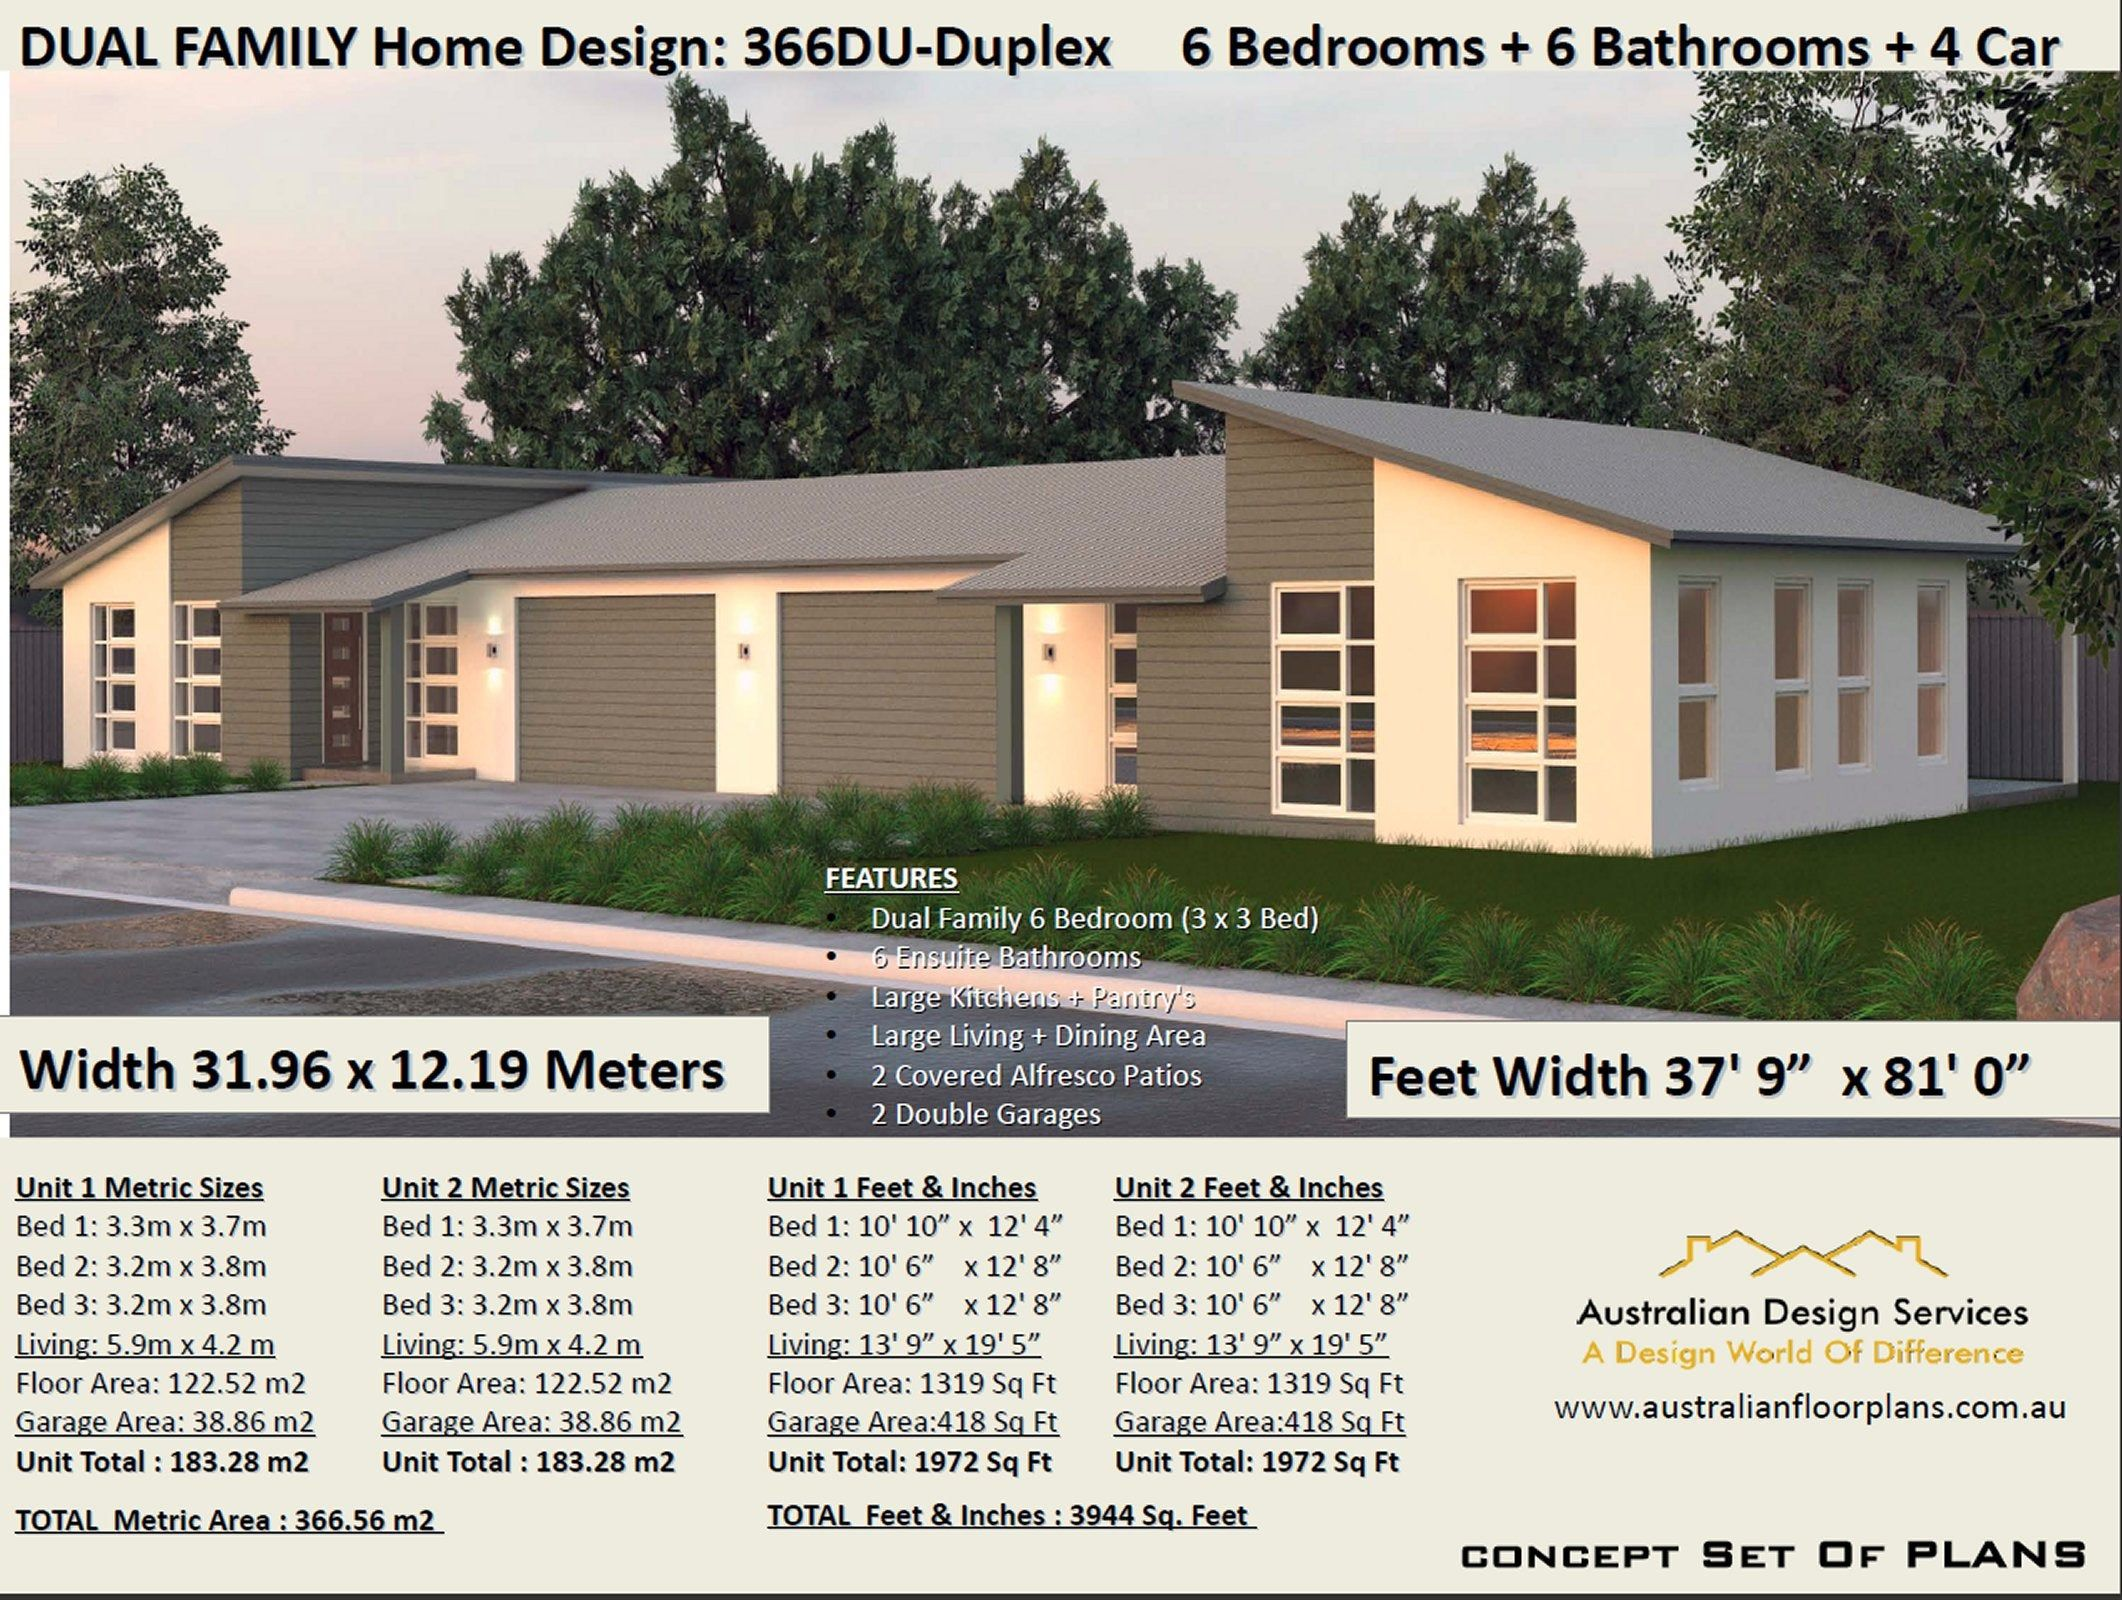 Spectacular Large Duplex House Plans 6 Bedrooms 6 Ensuite Etsy In 2021 Duplex House Plans Duplex House Duplex Design